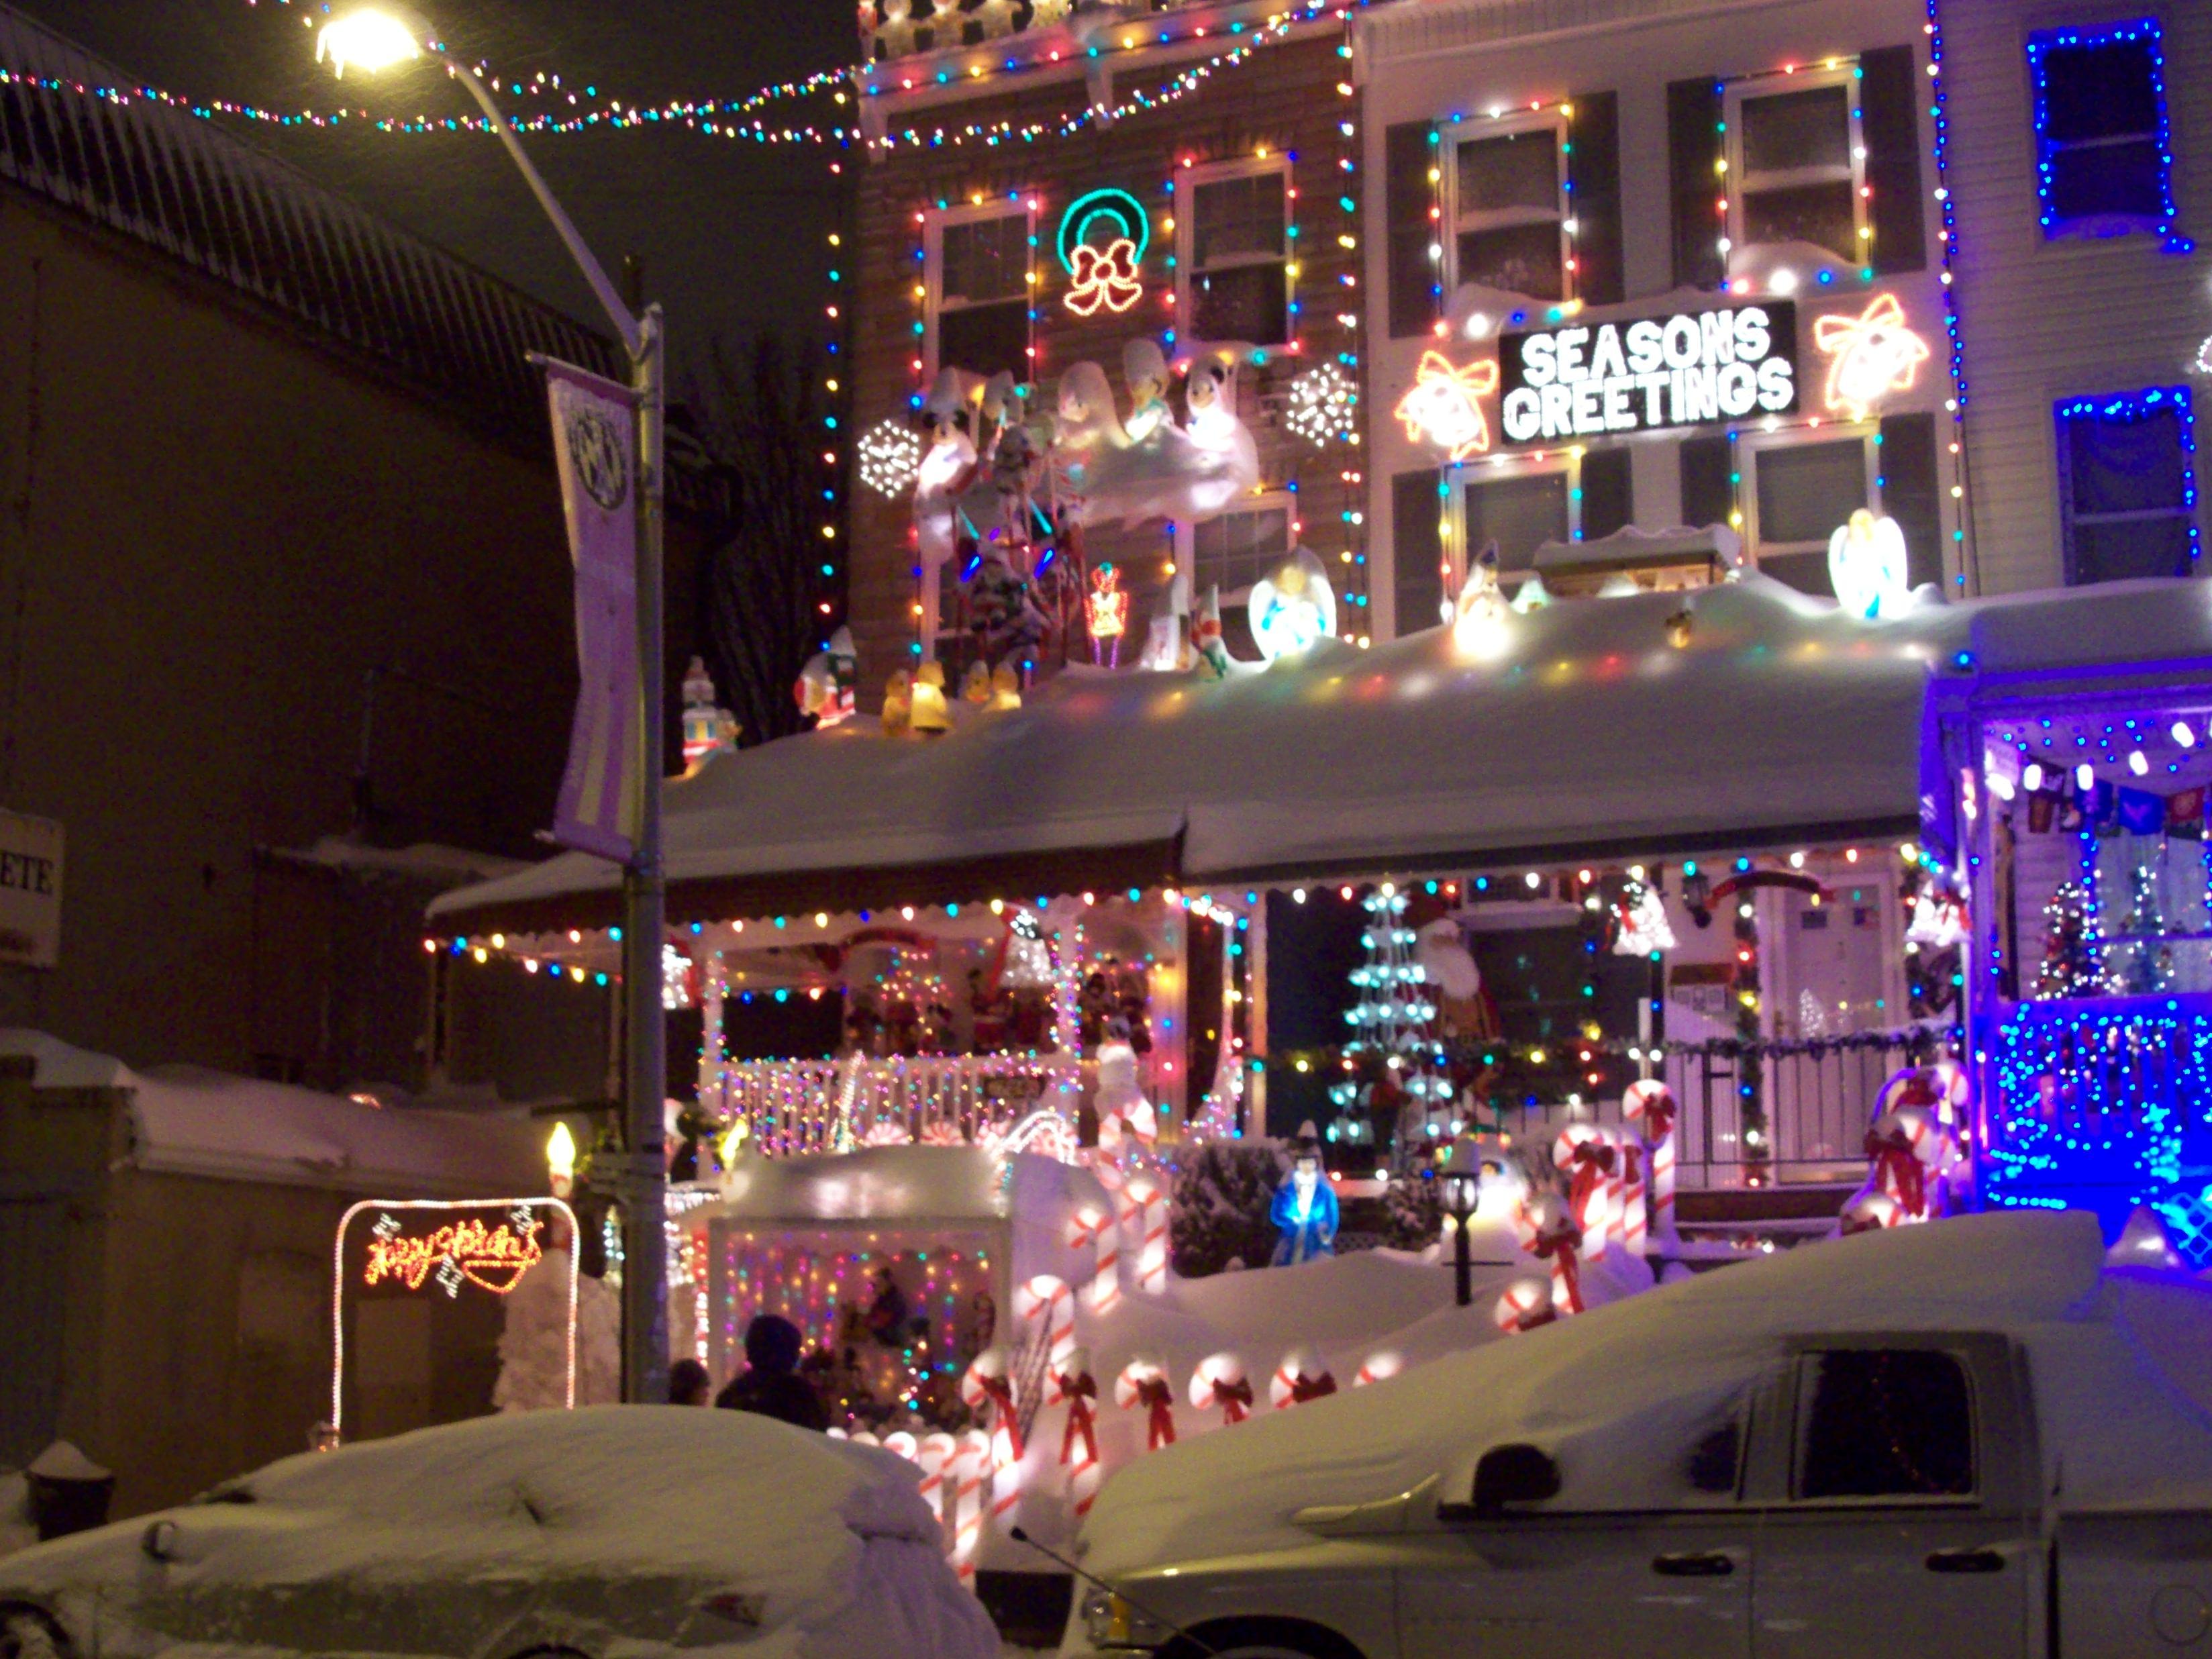 file34th street lights hampdenjpg - Baltimore 34th Street Christmas Lights